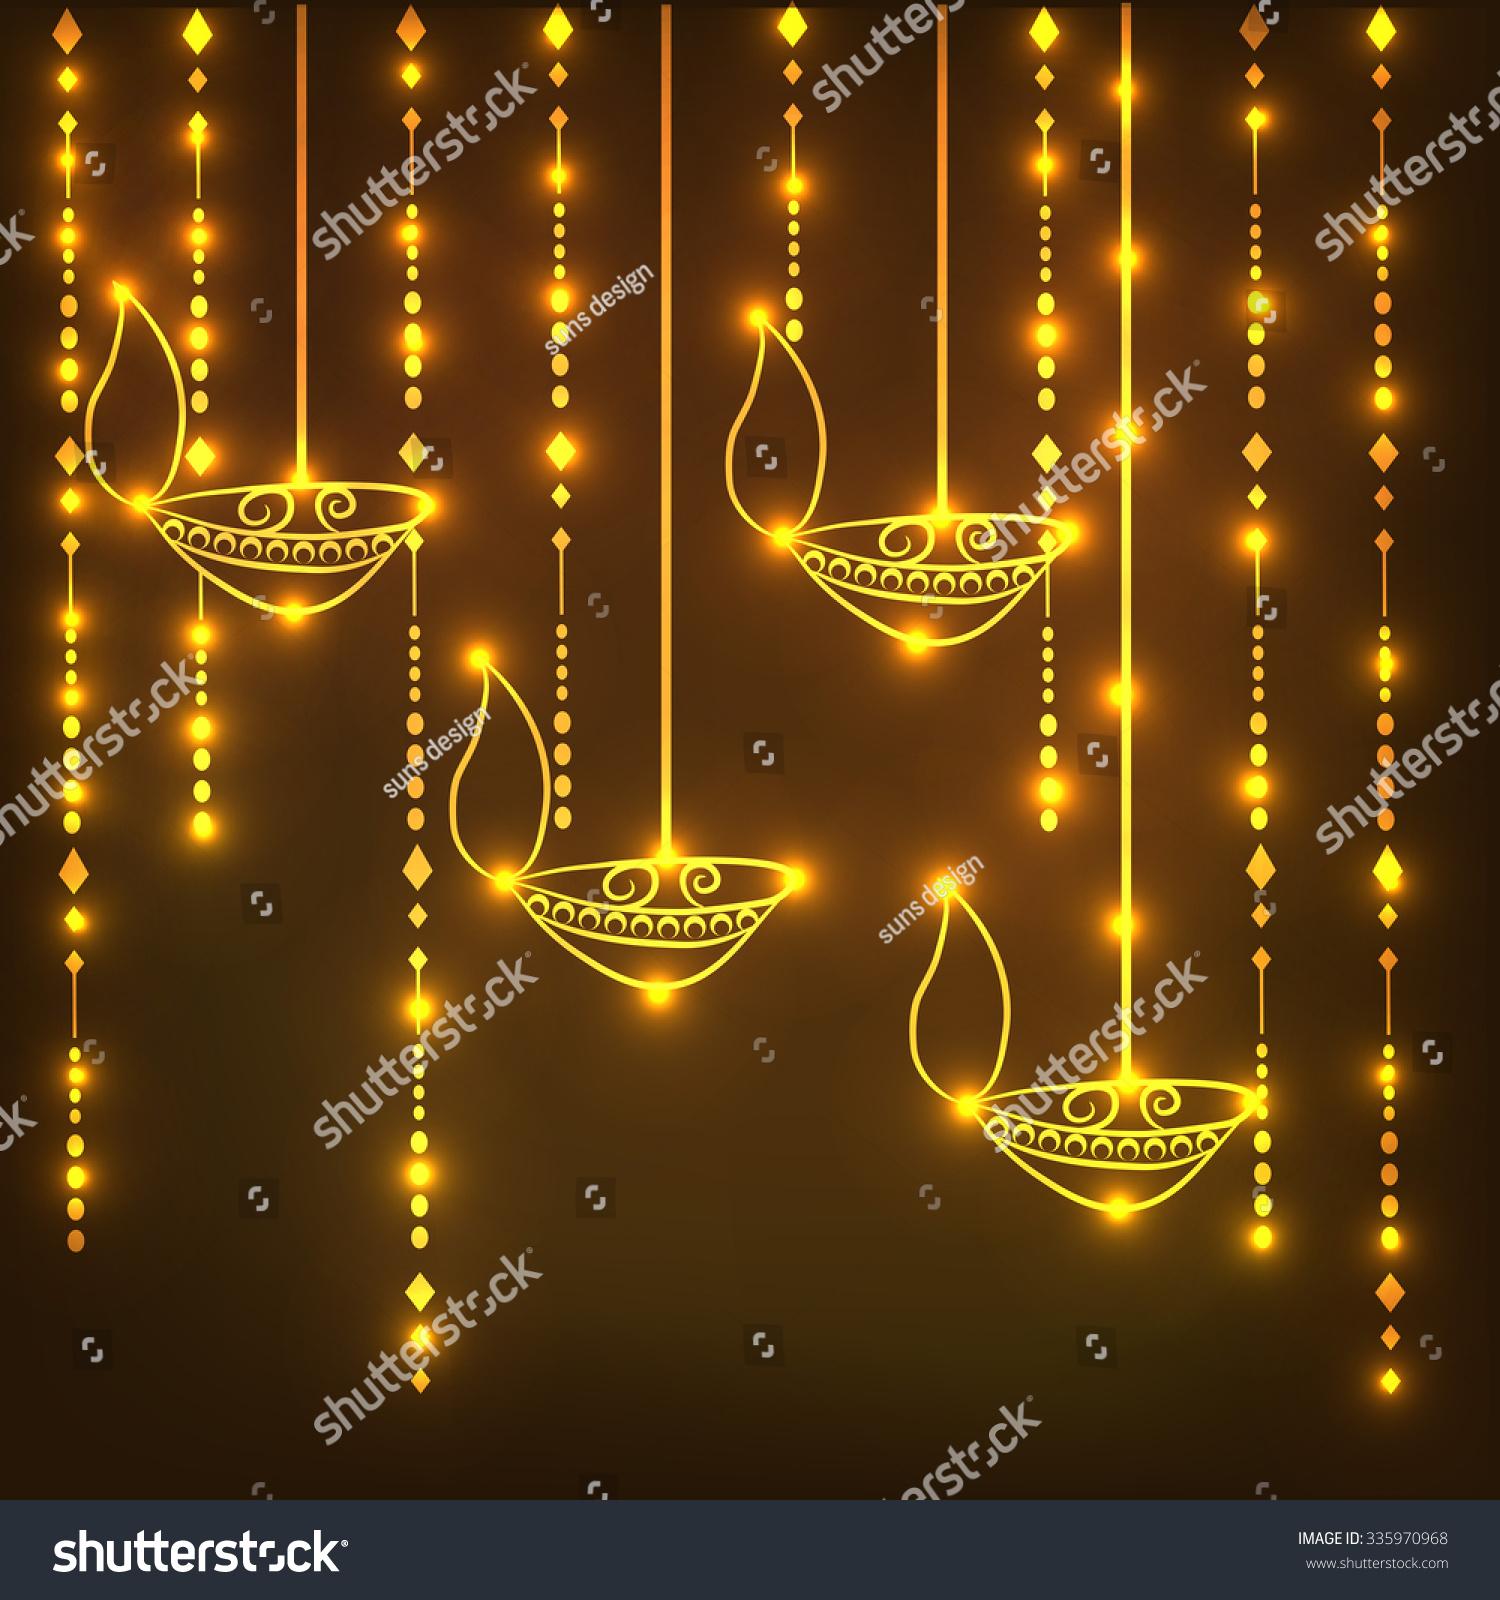 Illustration Of Beautiful Decorated Diwali Diya Background With Hanging